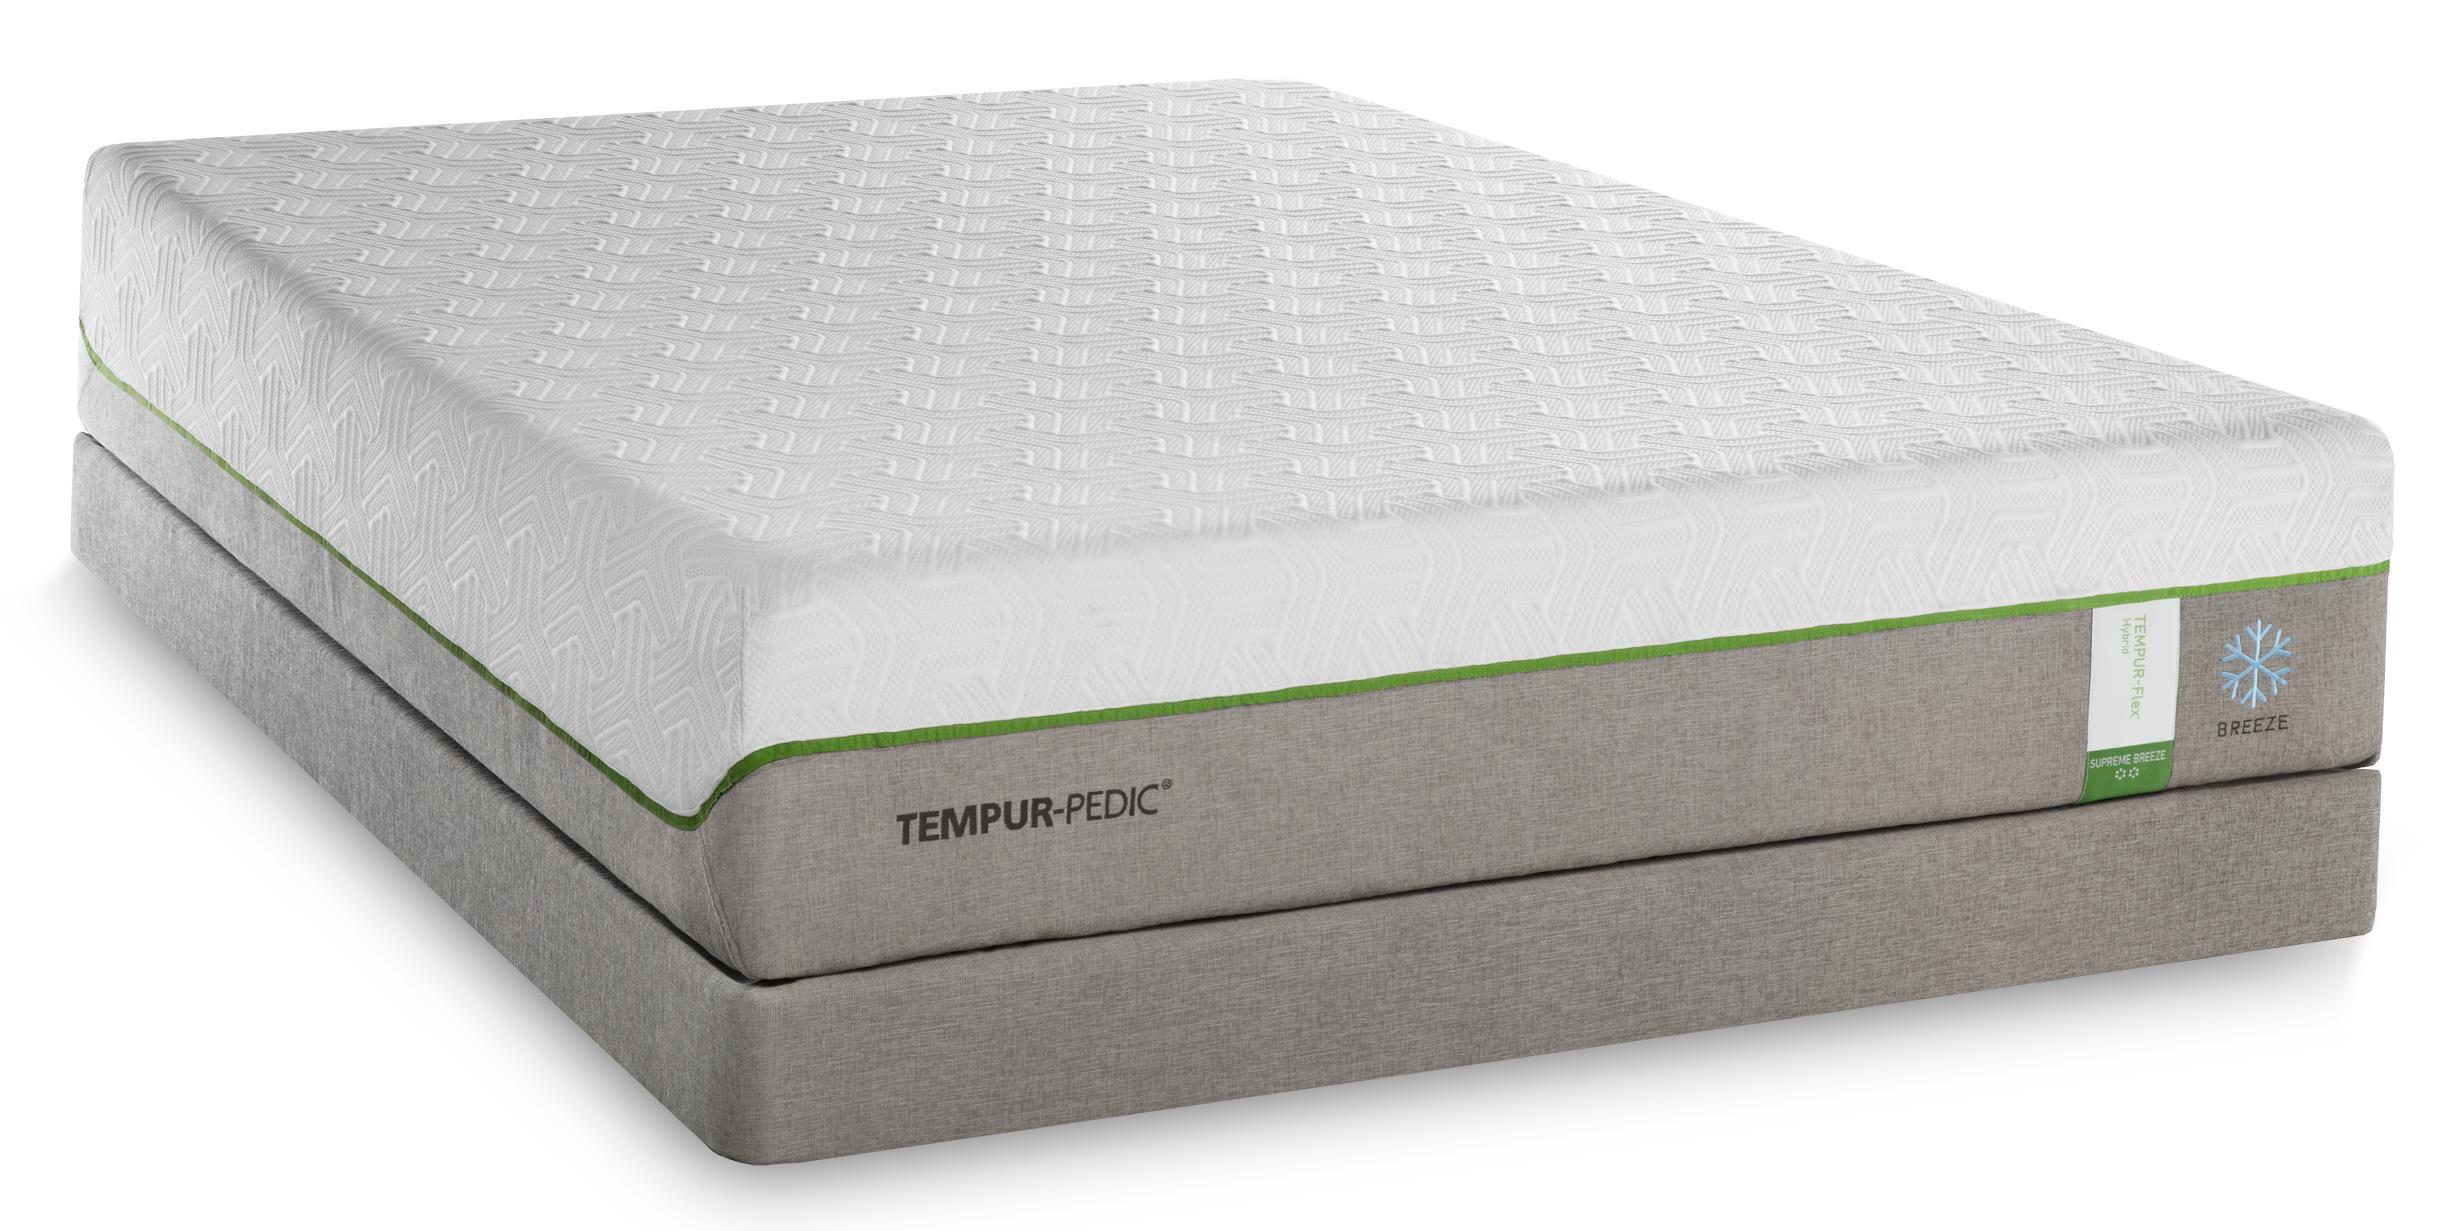 Tempur-Pedic® TEMPUR-Flex Supreme Breeze California King Medium Plush Matt Set, Adj - Item Number: 10292280+2x25287190